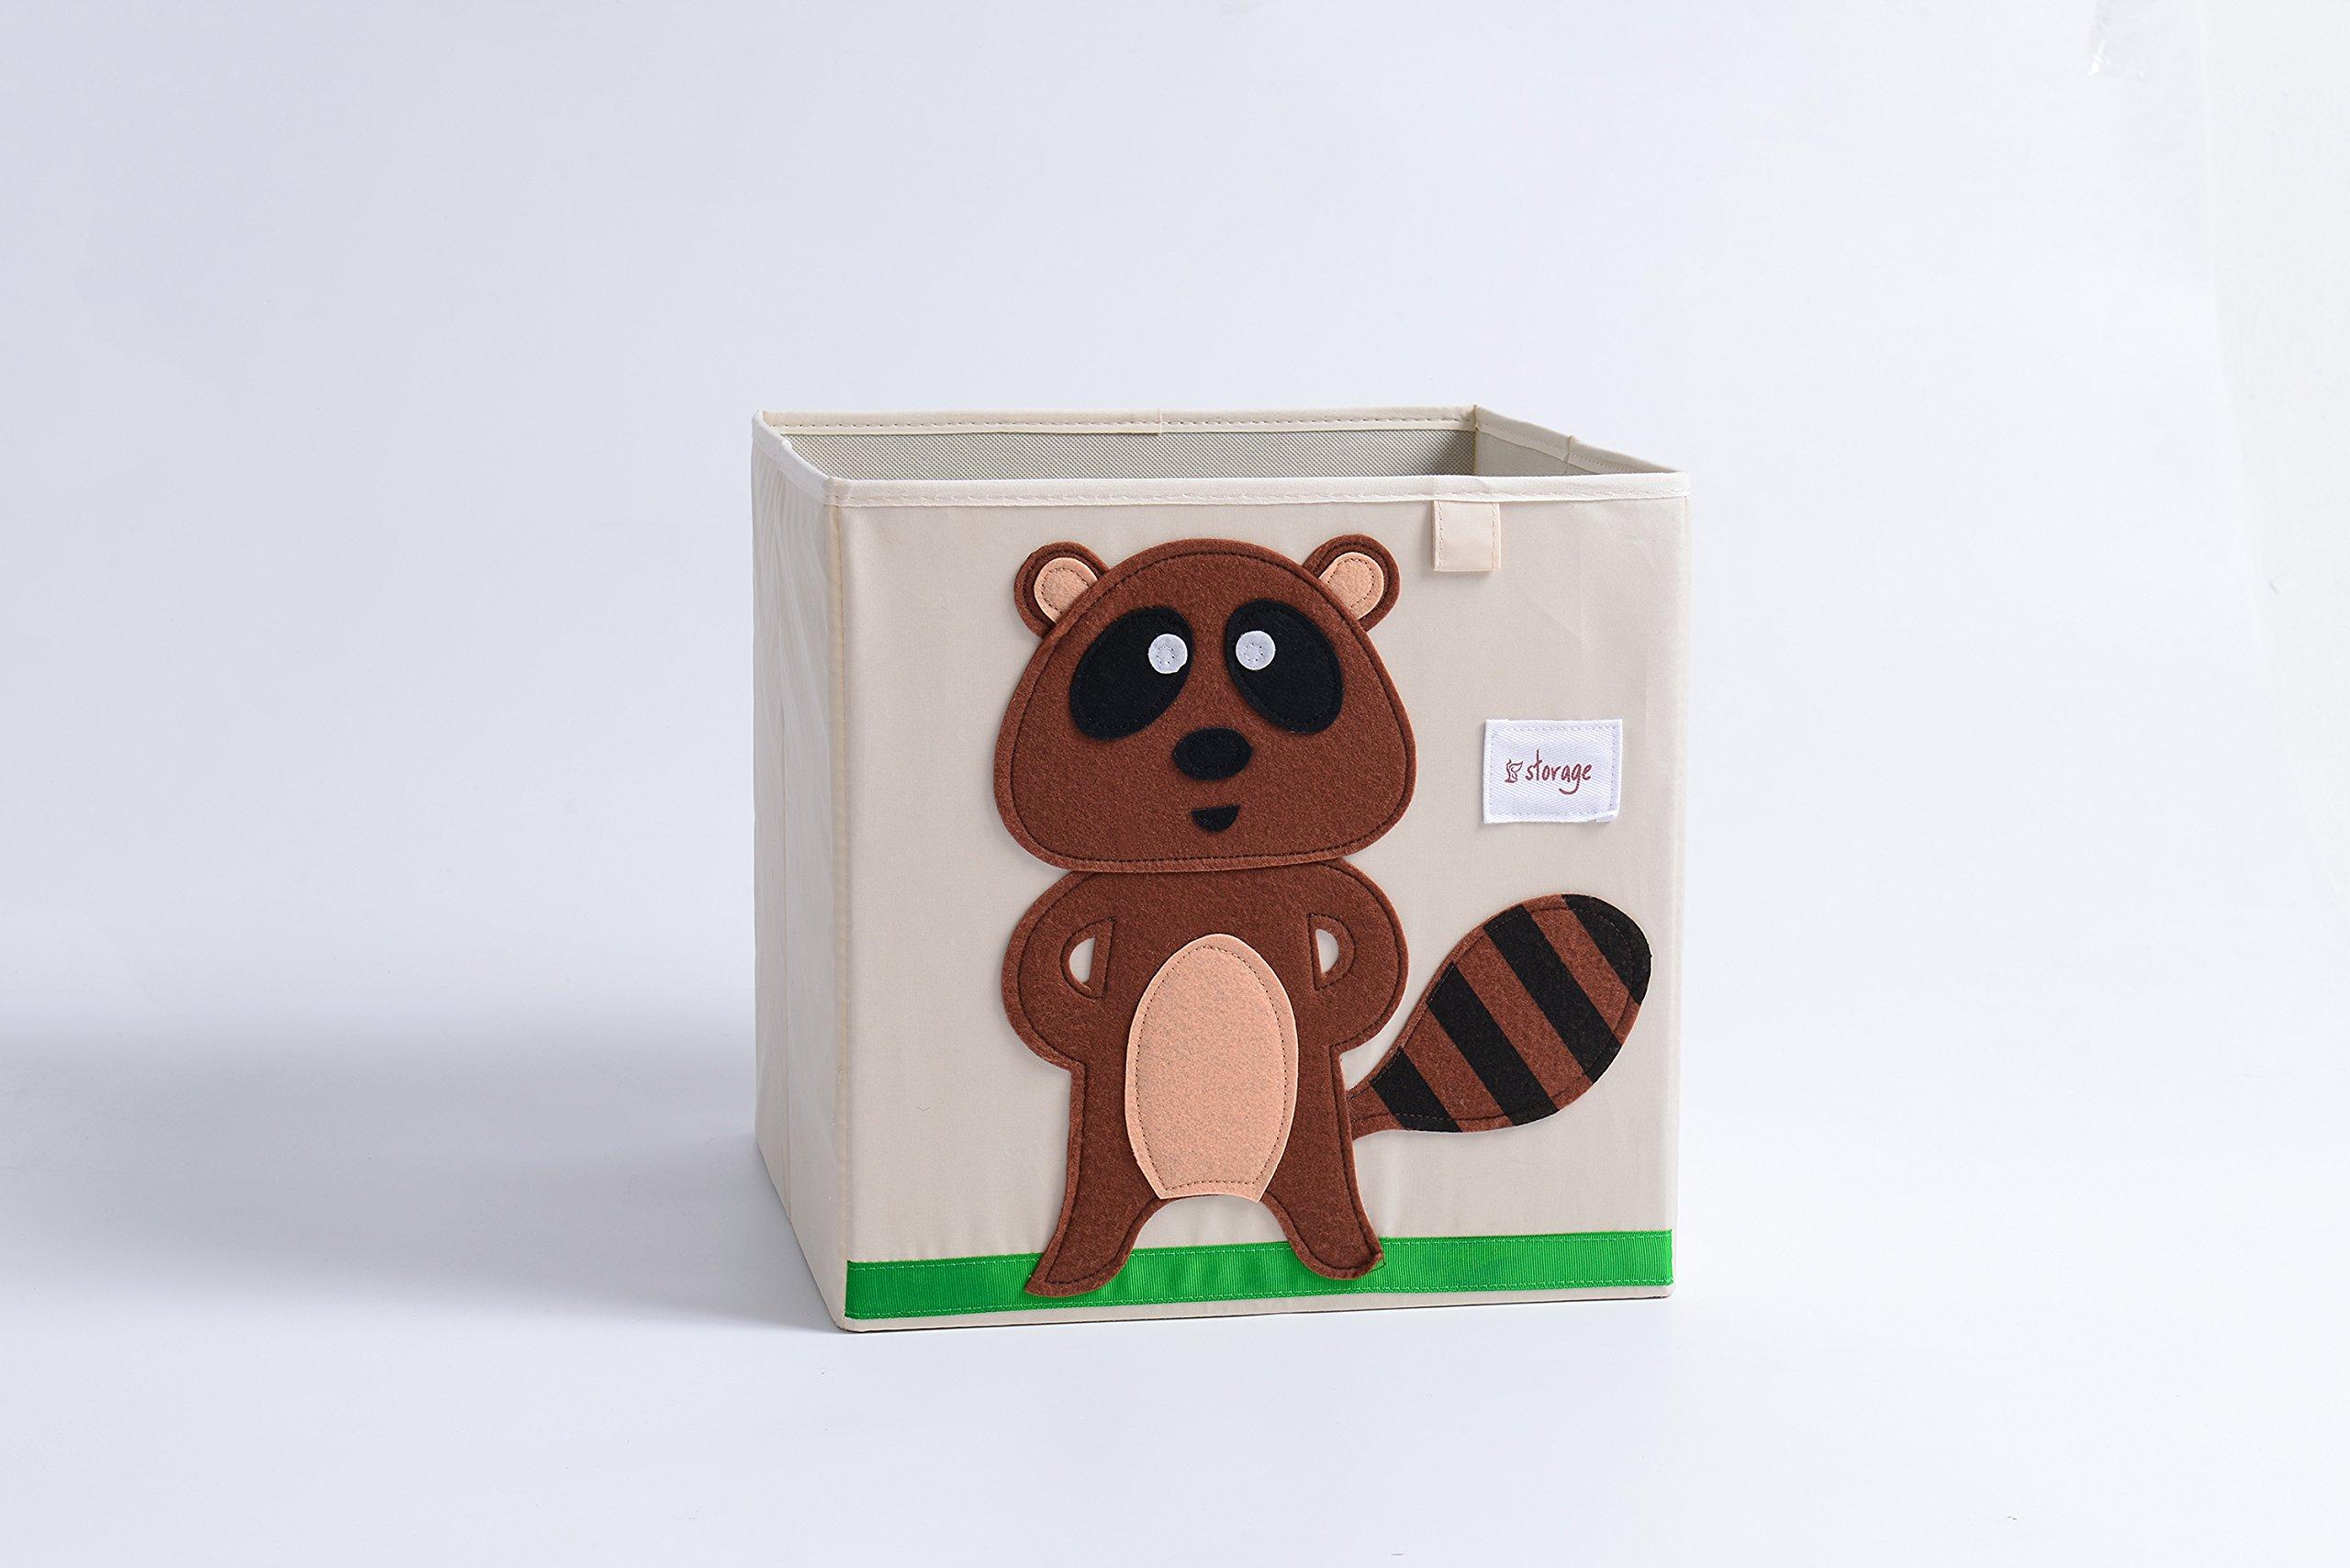 Animal Storage- 13 x 13 x 13'', Collapsible,Storage Toy Box for Kids,Cartoon Theme New Design (Raccoon)